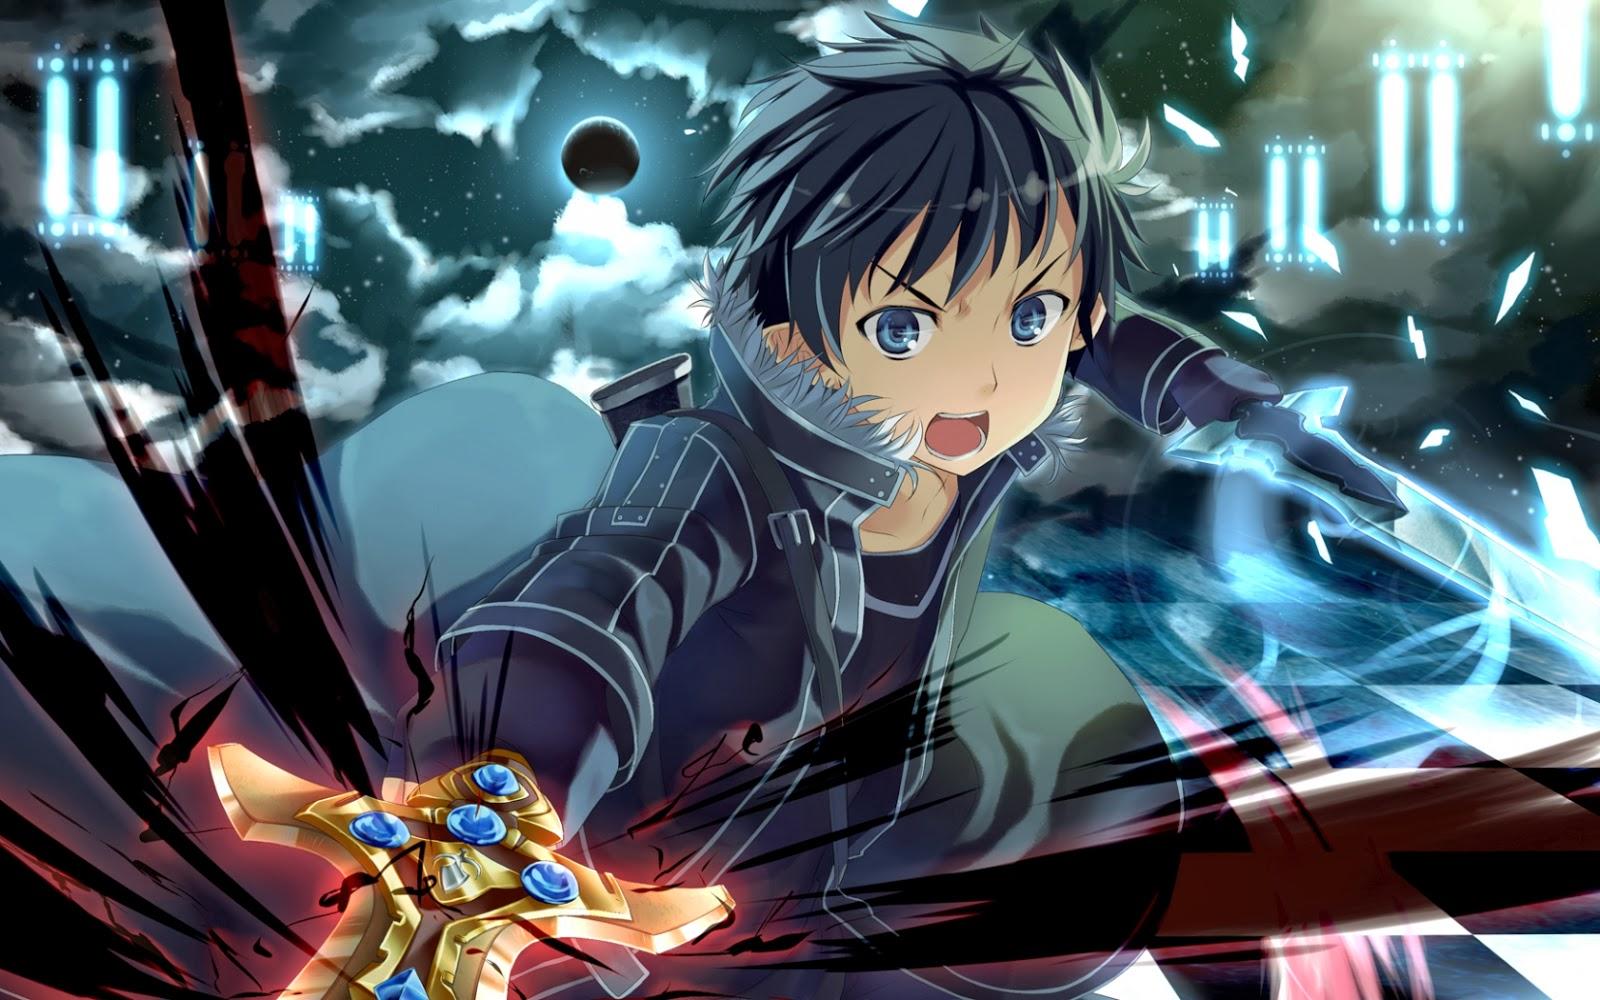 SAO Sword Art Online Wallpapers | Otaku brings us together